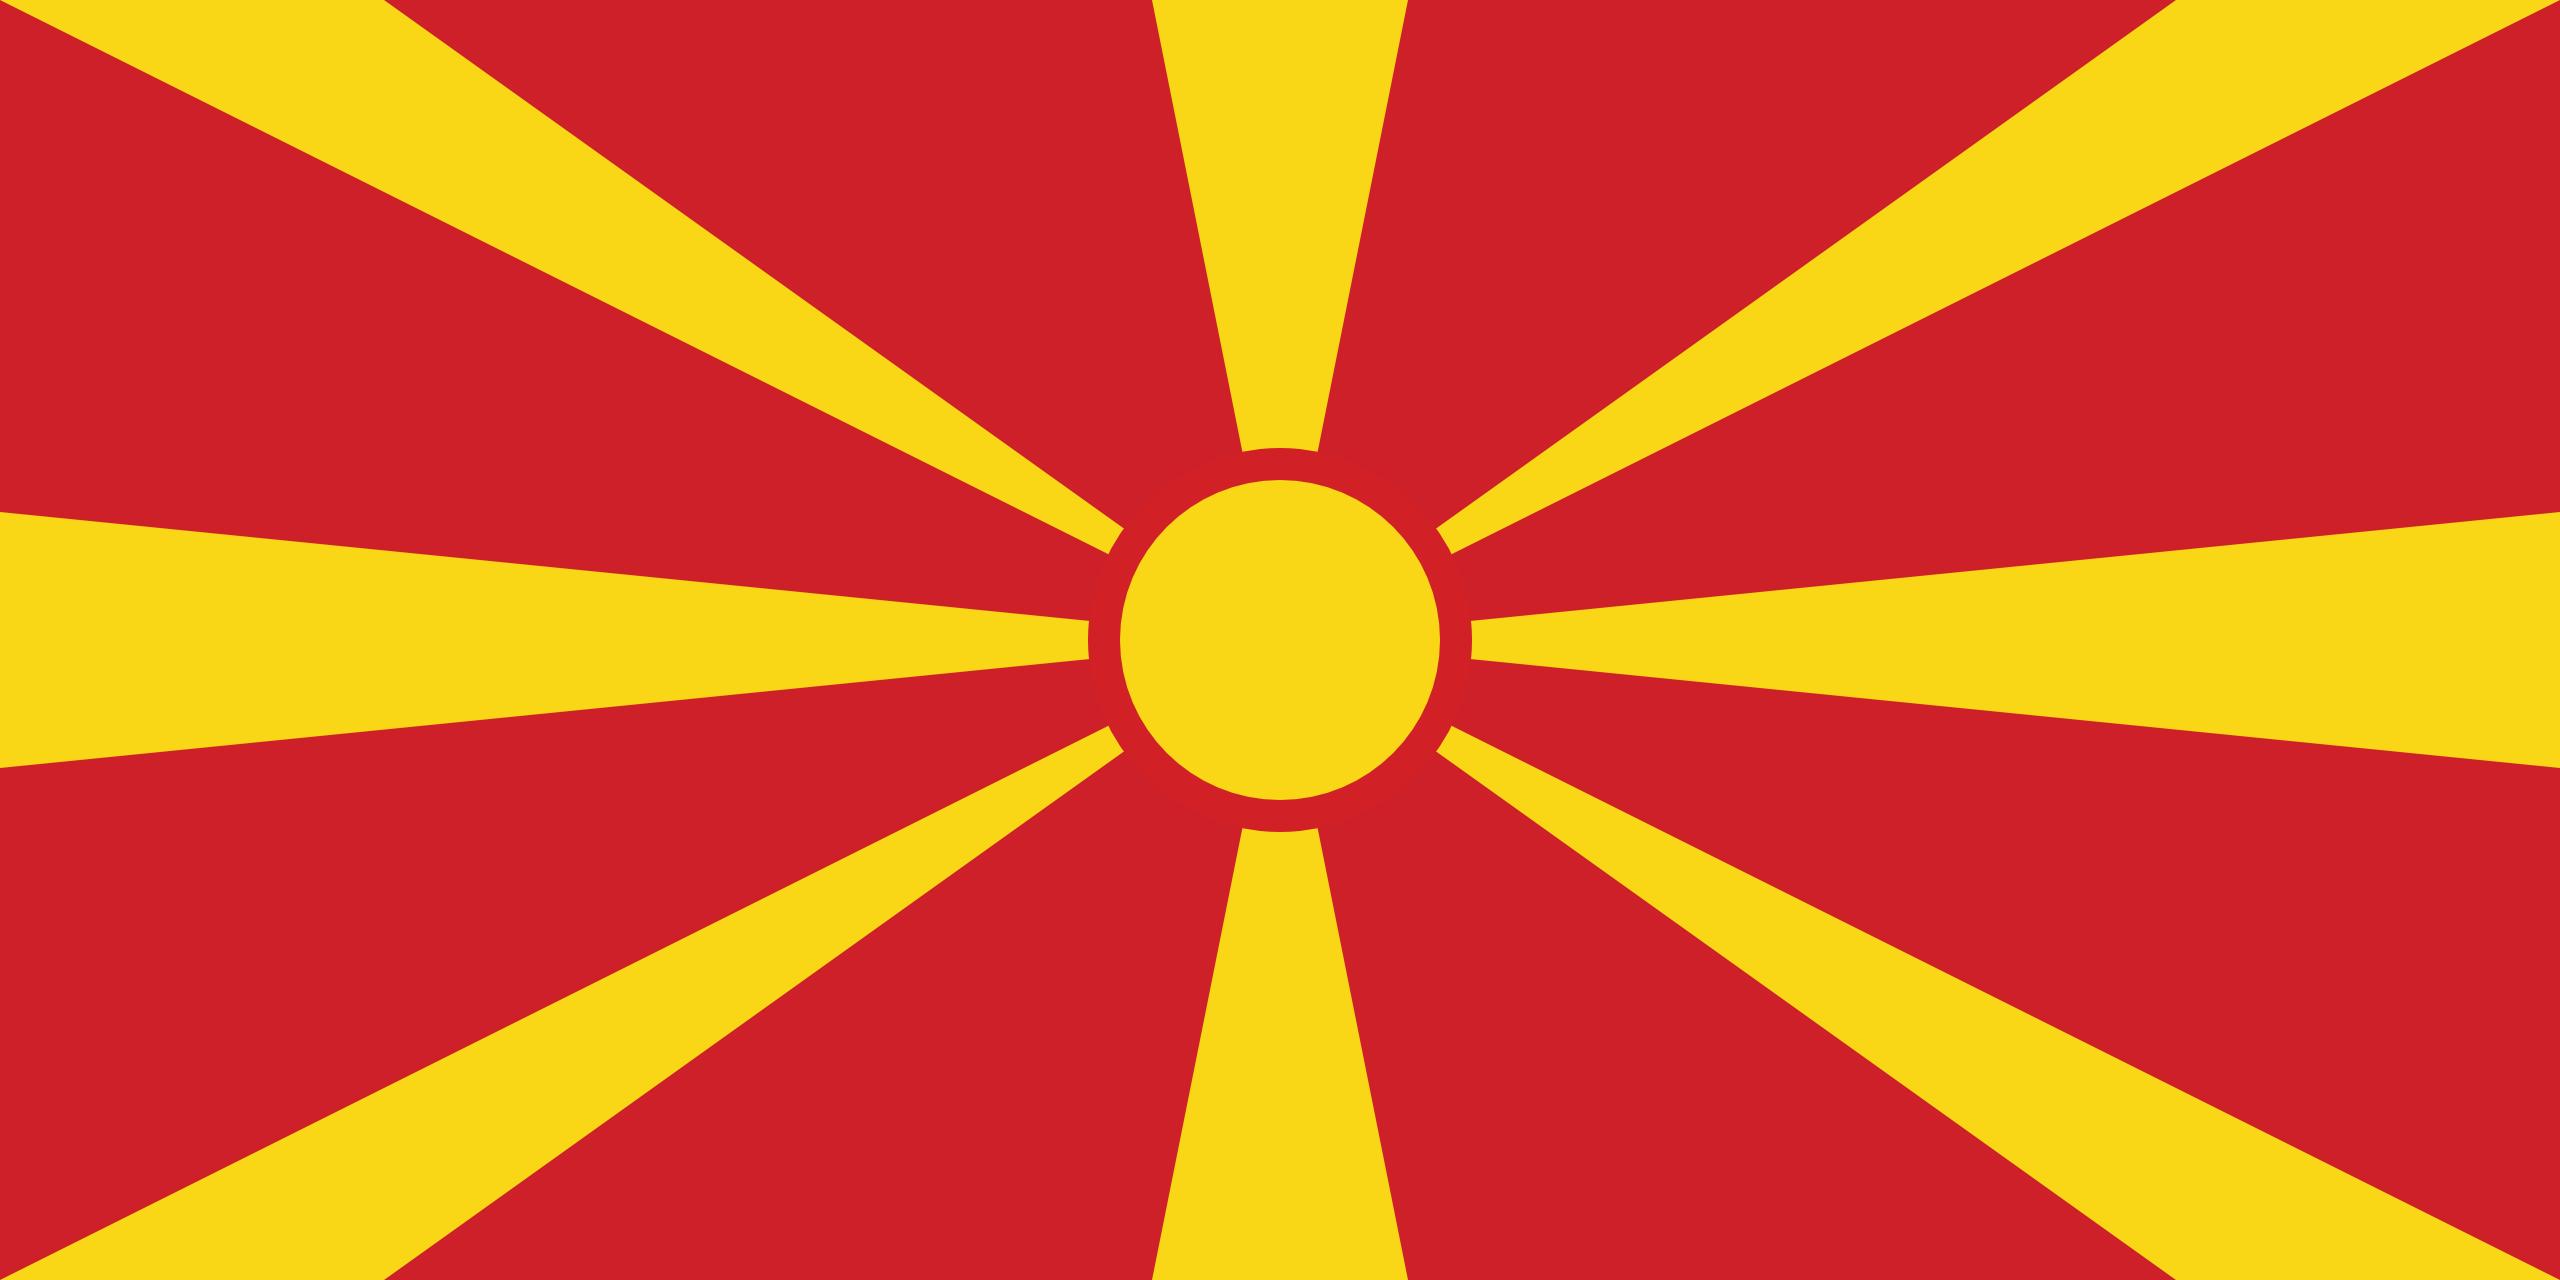 macedonia, paese, emblema, logo, simbolo - Sfondi HD - Professor-falken.com